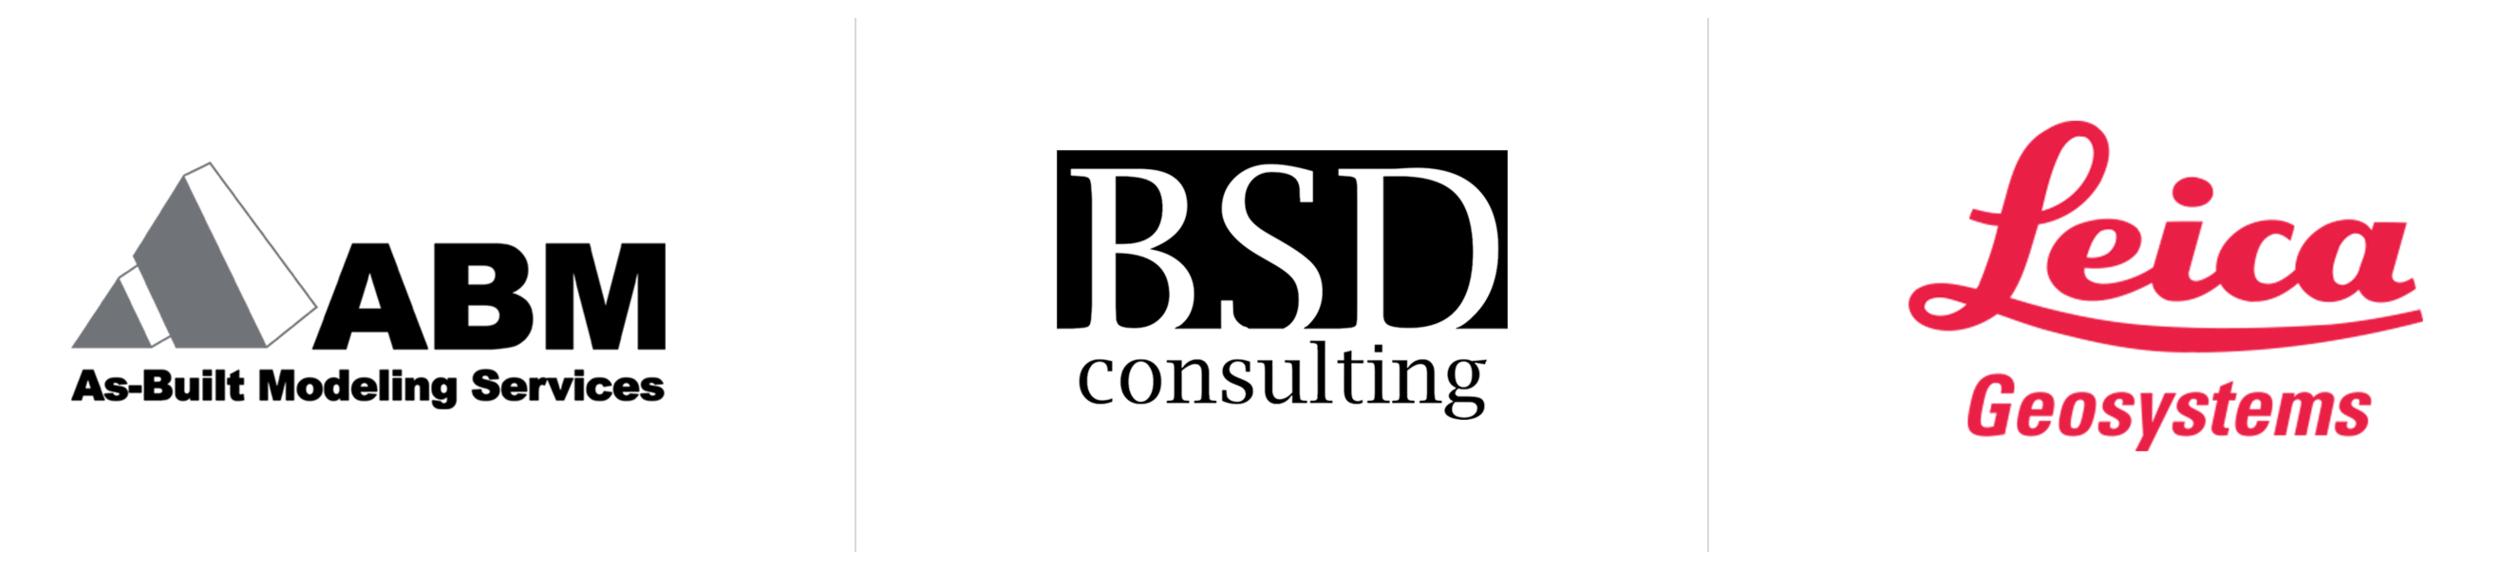 as built modeling services 3d scanning pipeline data management point cloud